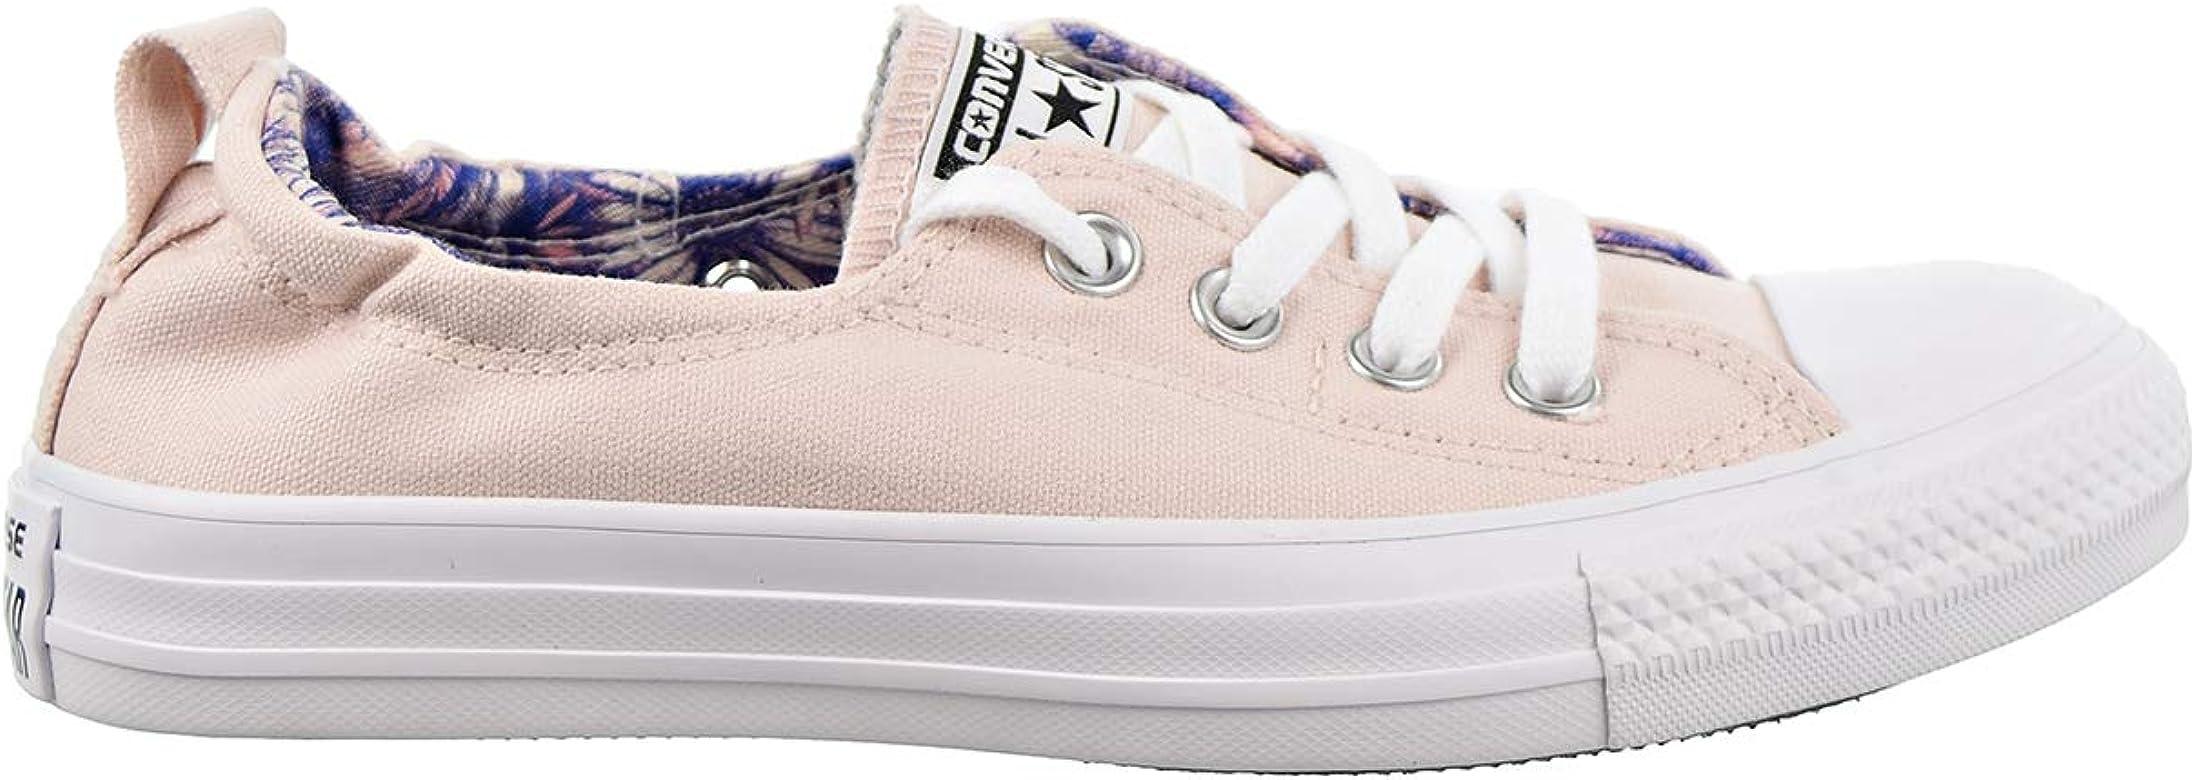 Converse Chuck Taylor All Star Shoreline Slip Womens Shoes